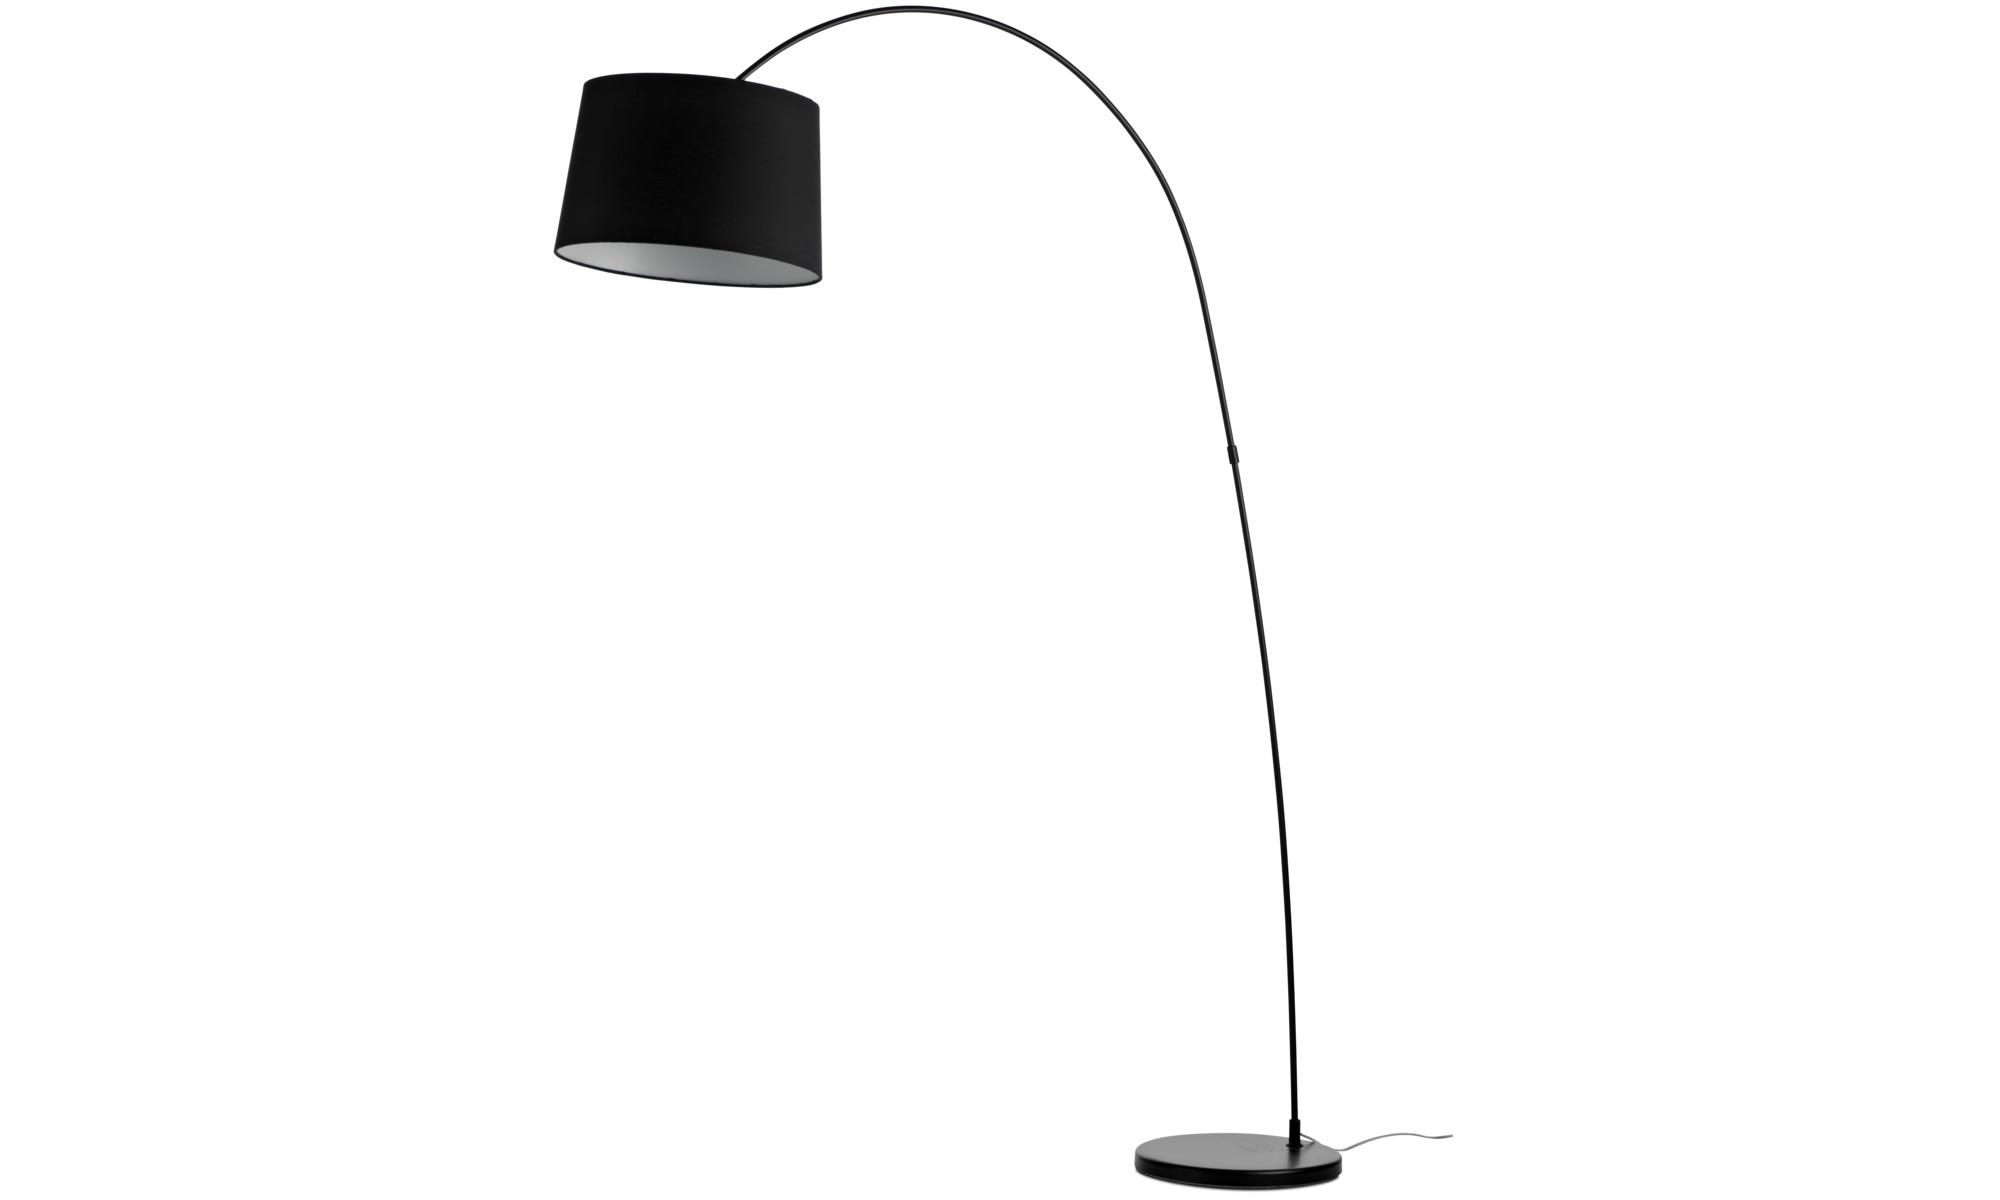 Lampy - Lampa podłogowa Kuta - Czarny - Metal